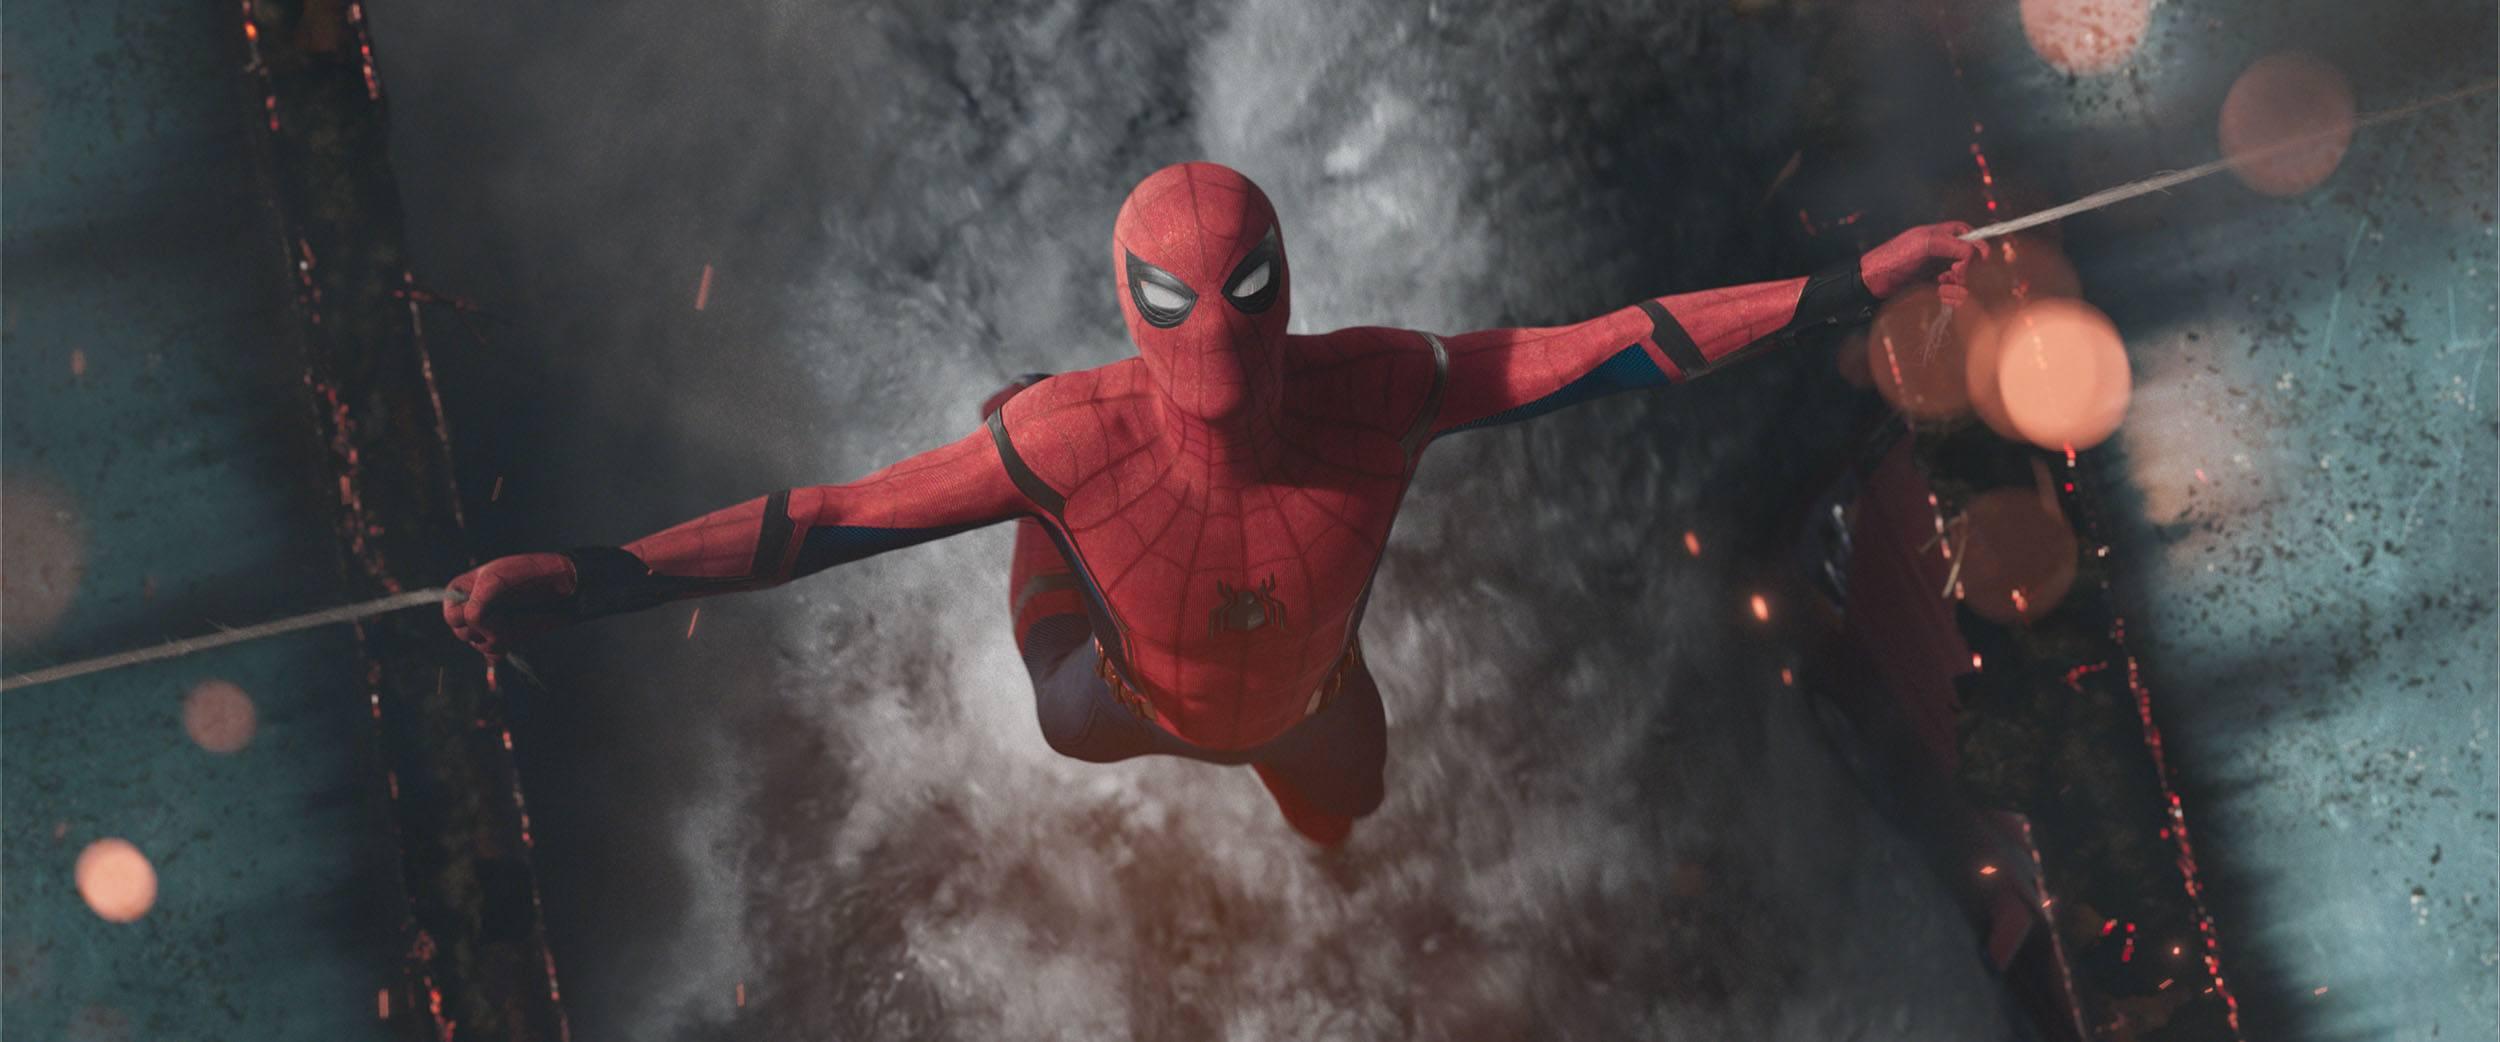 Spider-Man Fight Scenes In MCU